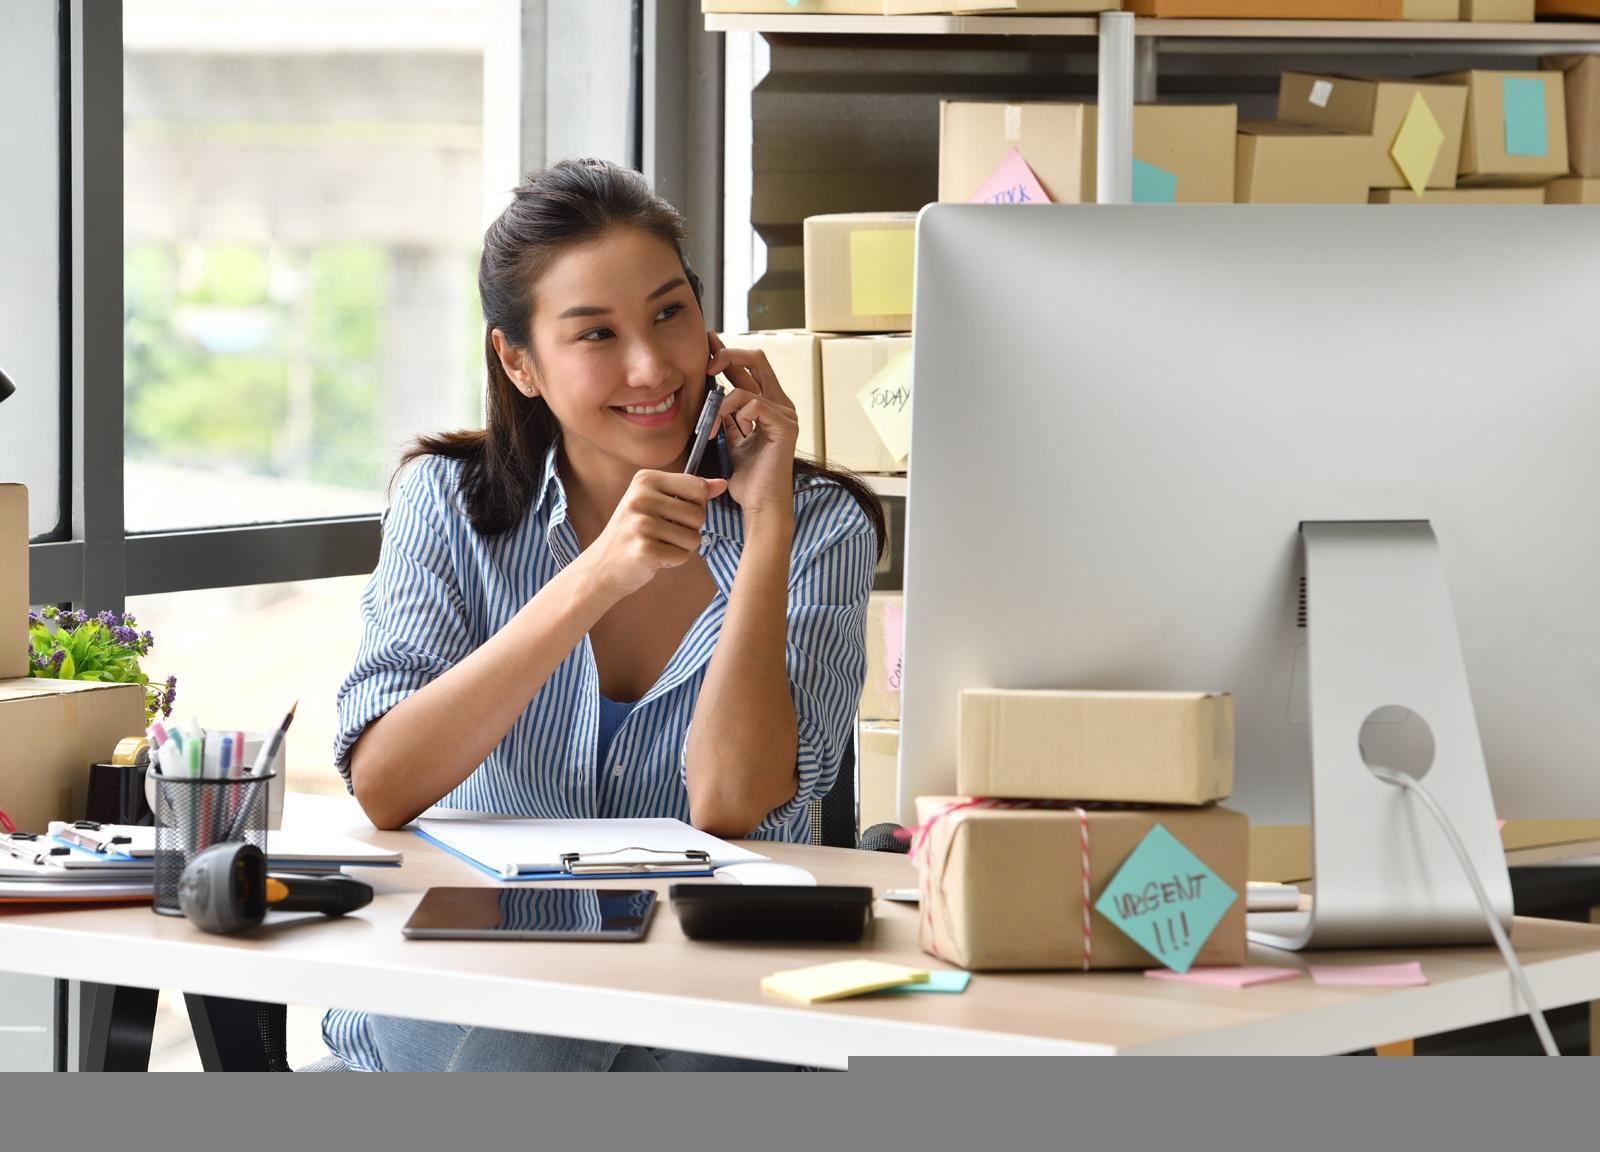 Vender online como Microempreendedor Individual - MEI